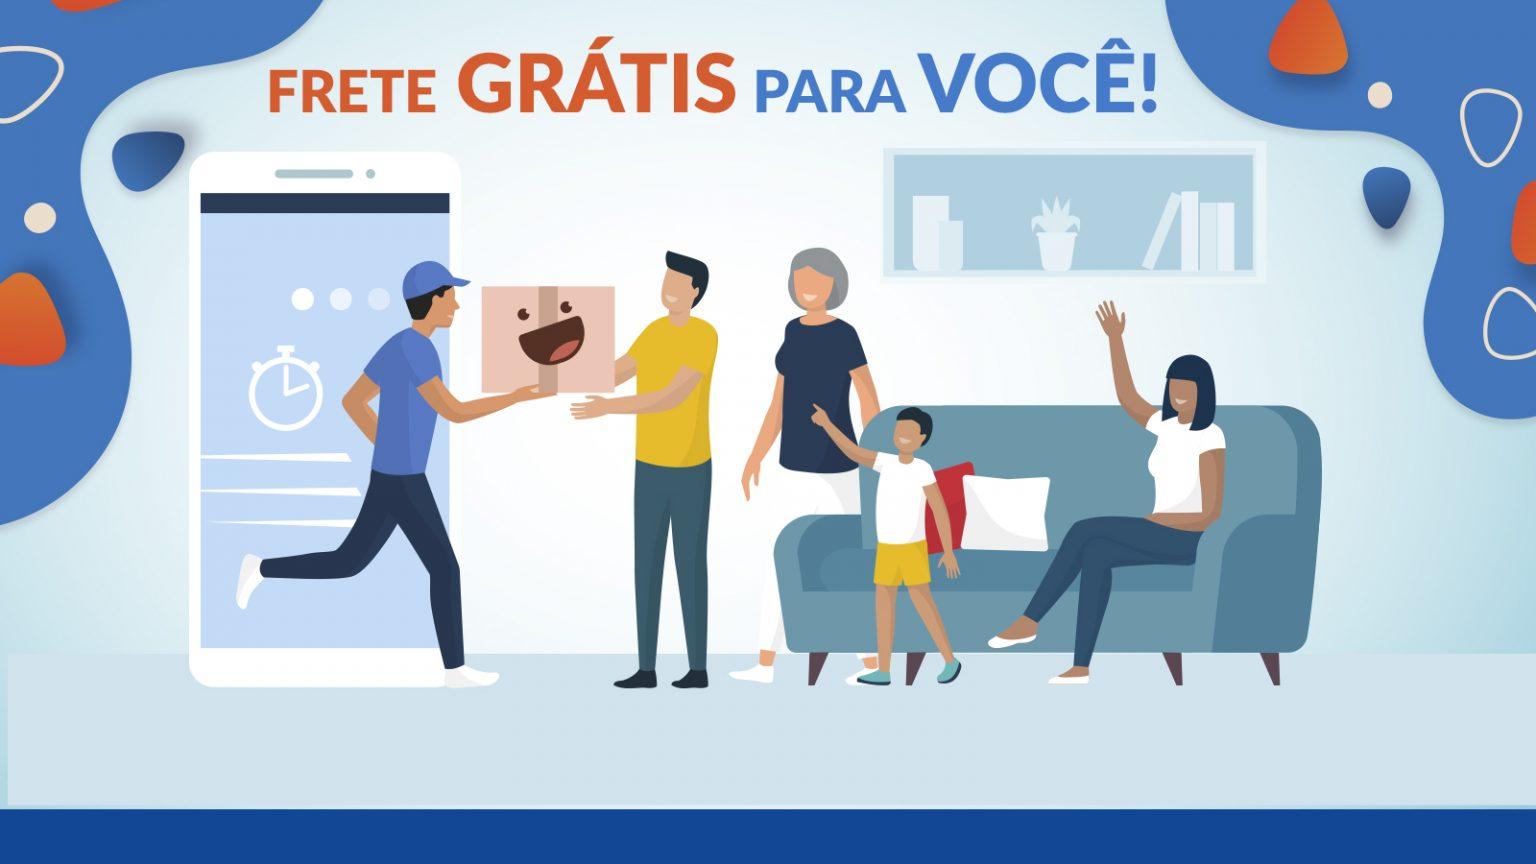 1600x1200px-banner-portal-FRETE-GRÁTIS-OUT-1536x864.jpg